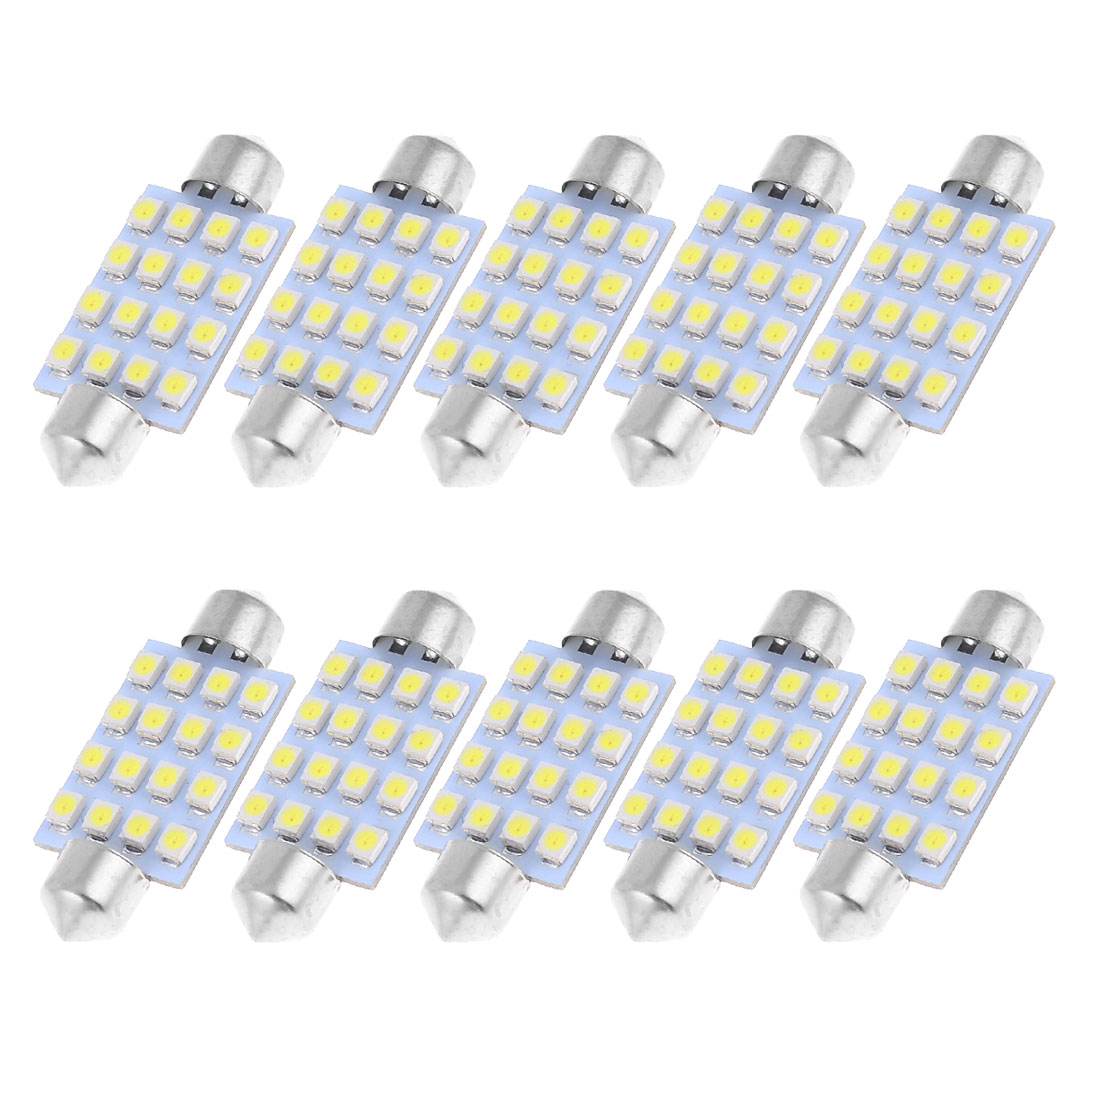 "10pcs 42mm 1.72"" 3528 1210 SMD 16-LED Festoon Dome Light White 211-2 212-2 569"